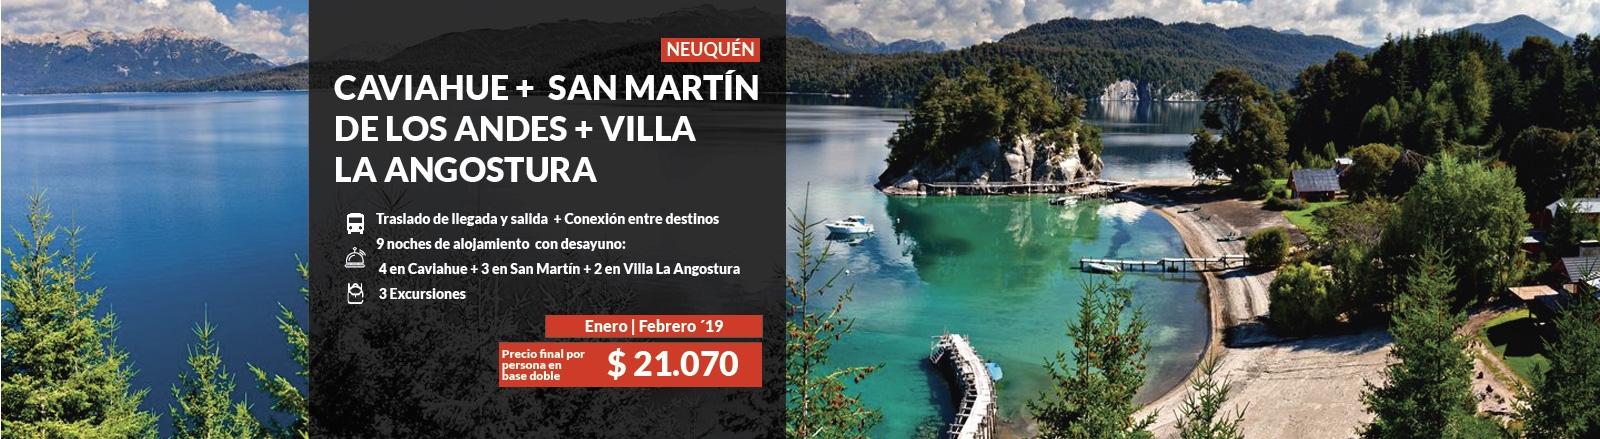 Caviahue, San Martín & Villa La Angostura - Neuquén